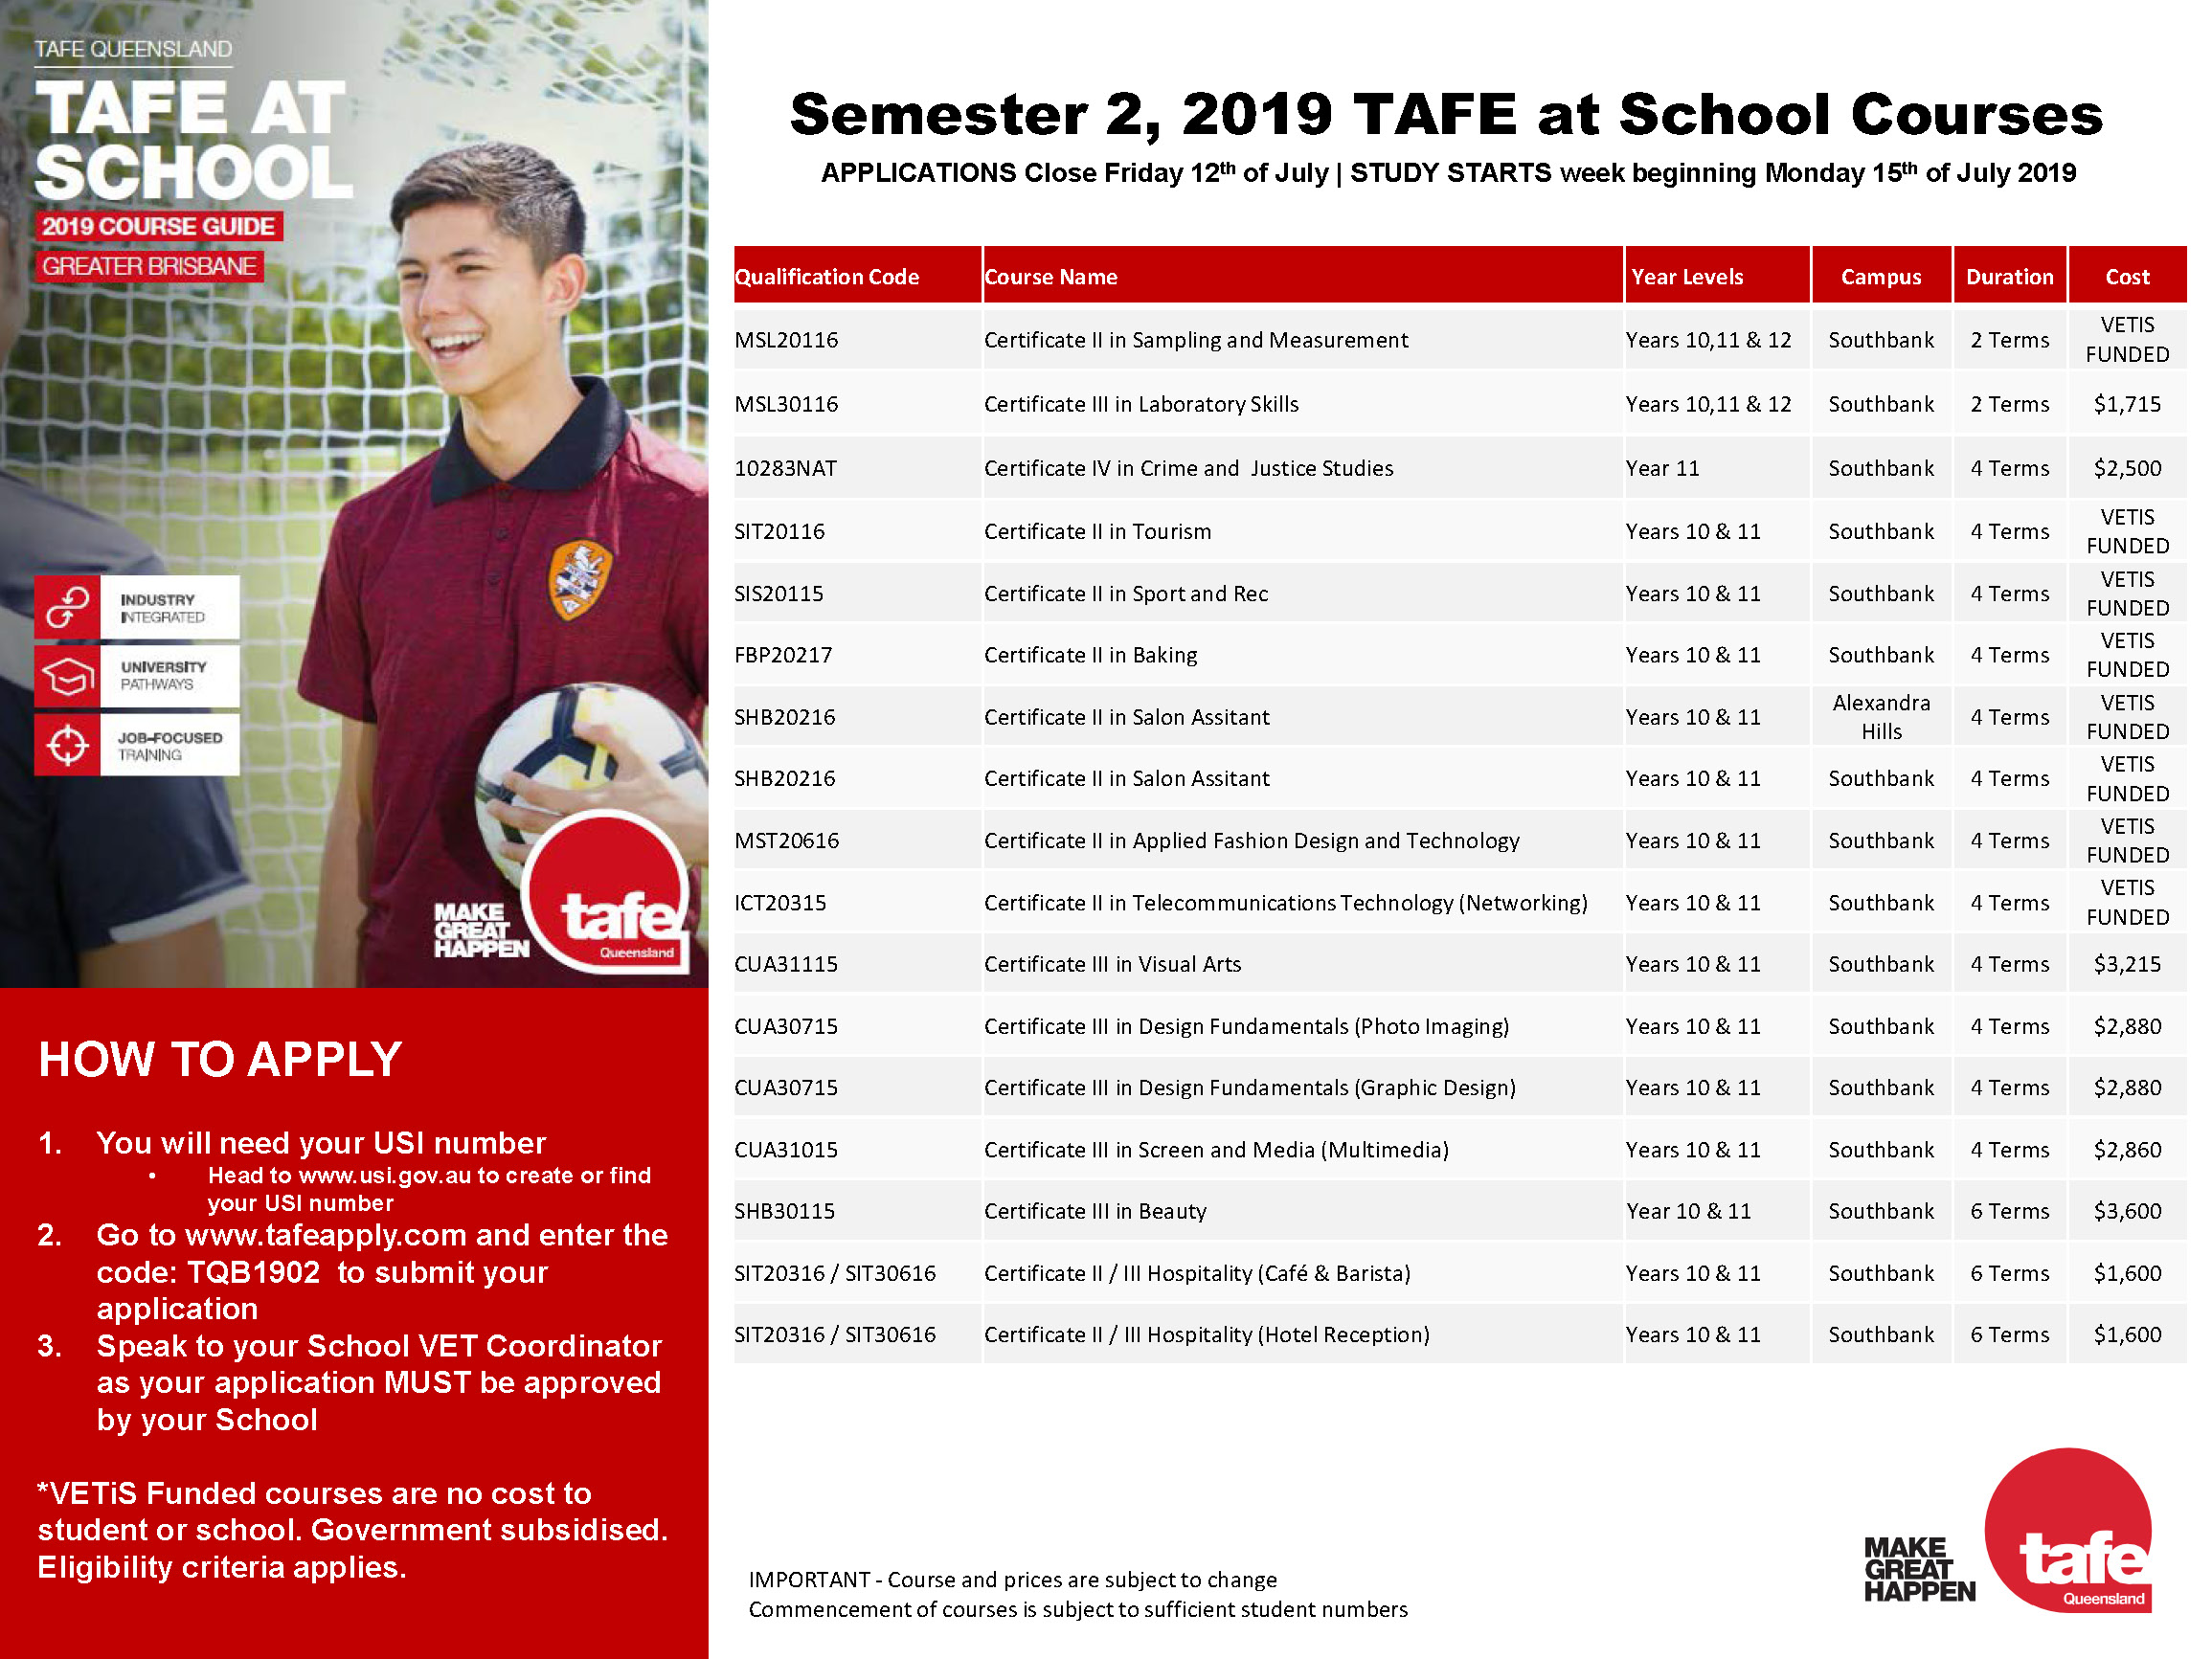 Semester 2 TAFE Courses – Mueller Connect